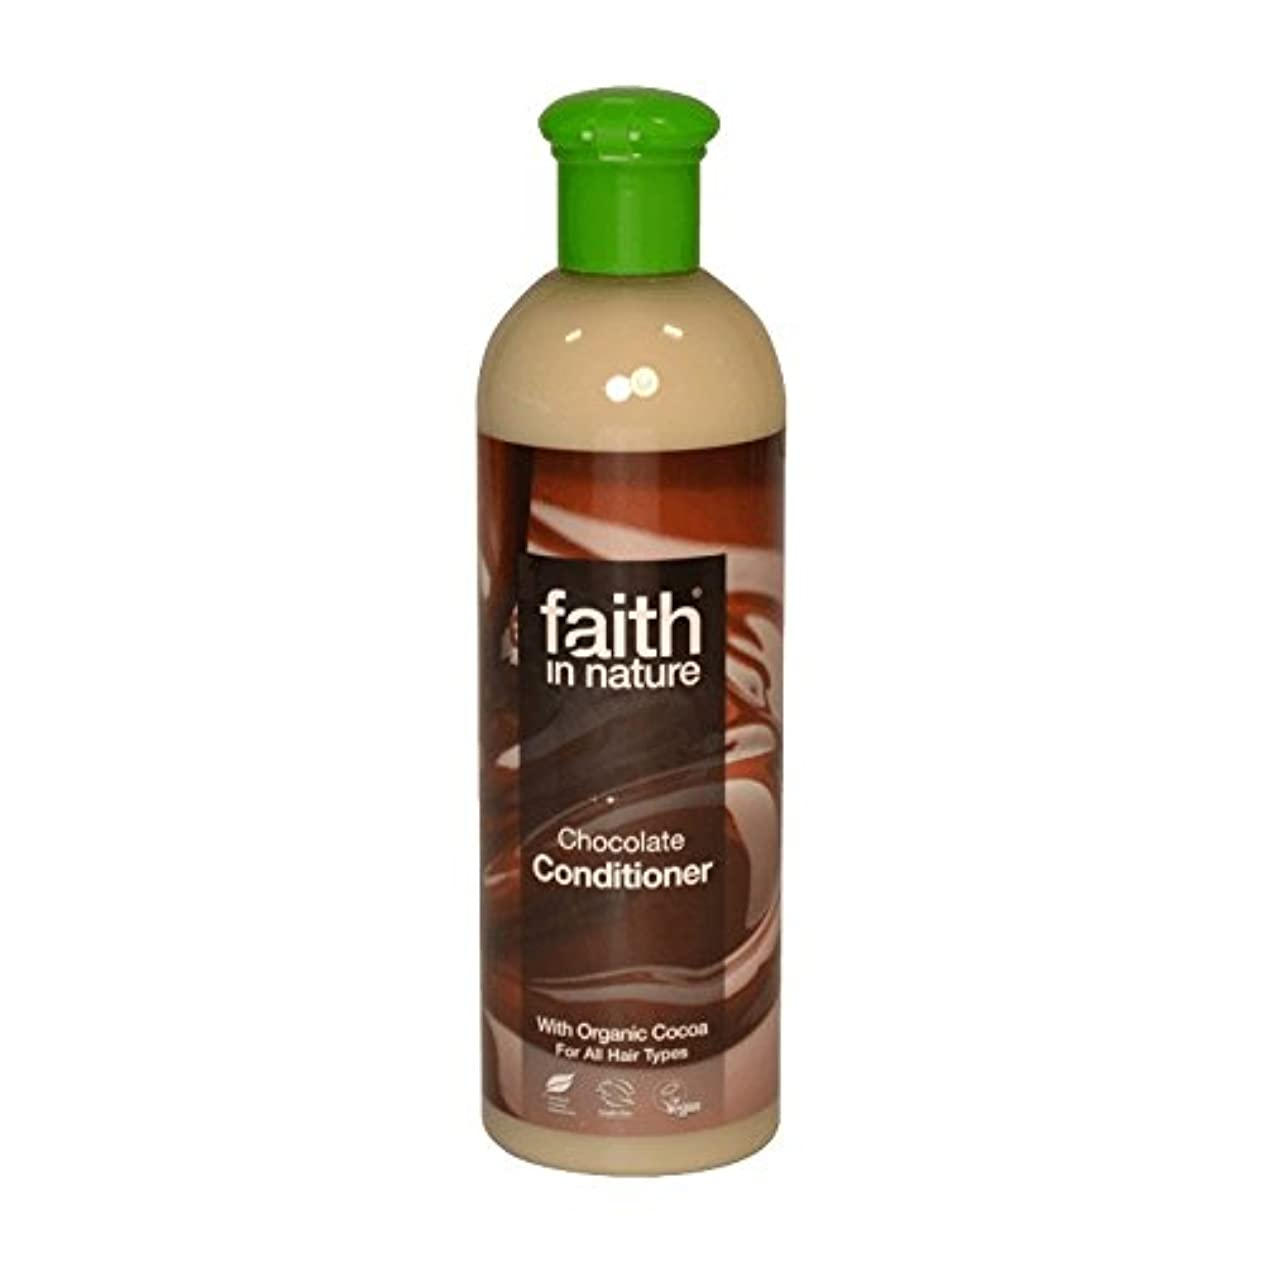 Faith In Nature Chocolate Conditioner 400ml (Pack of 2) - 自然チョコレートコンディショナー400ミリリットルの信仰 (x2) [並行輸入品]